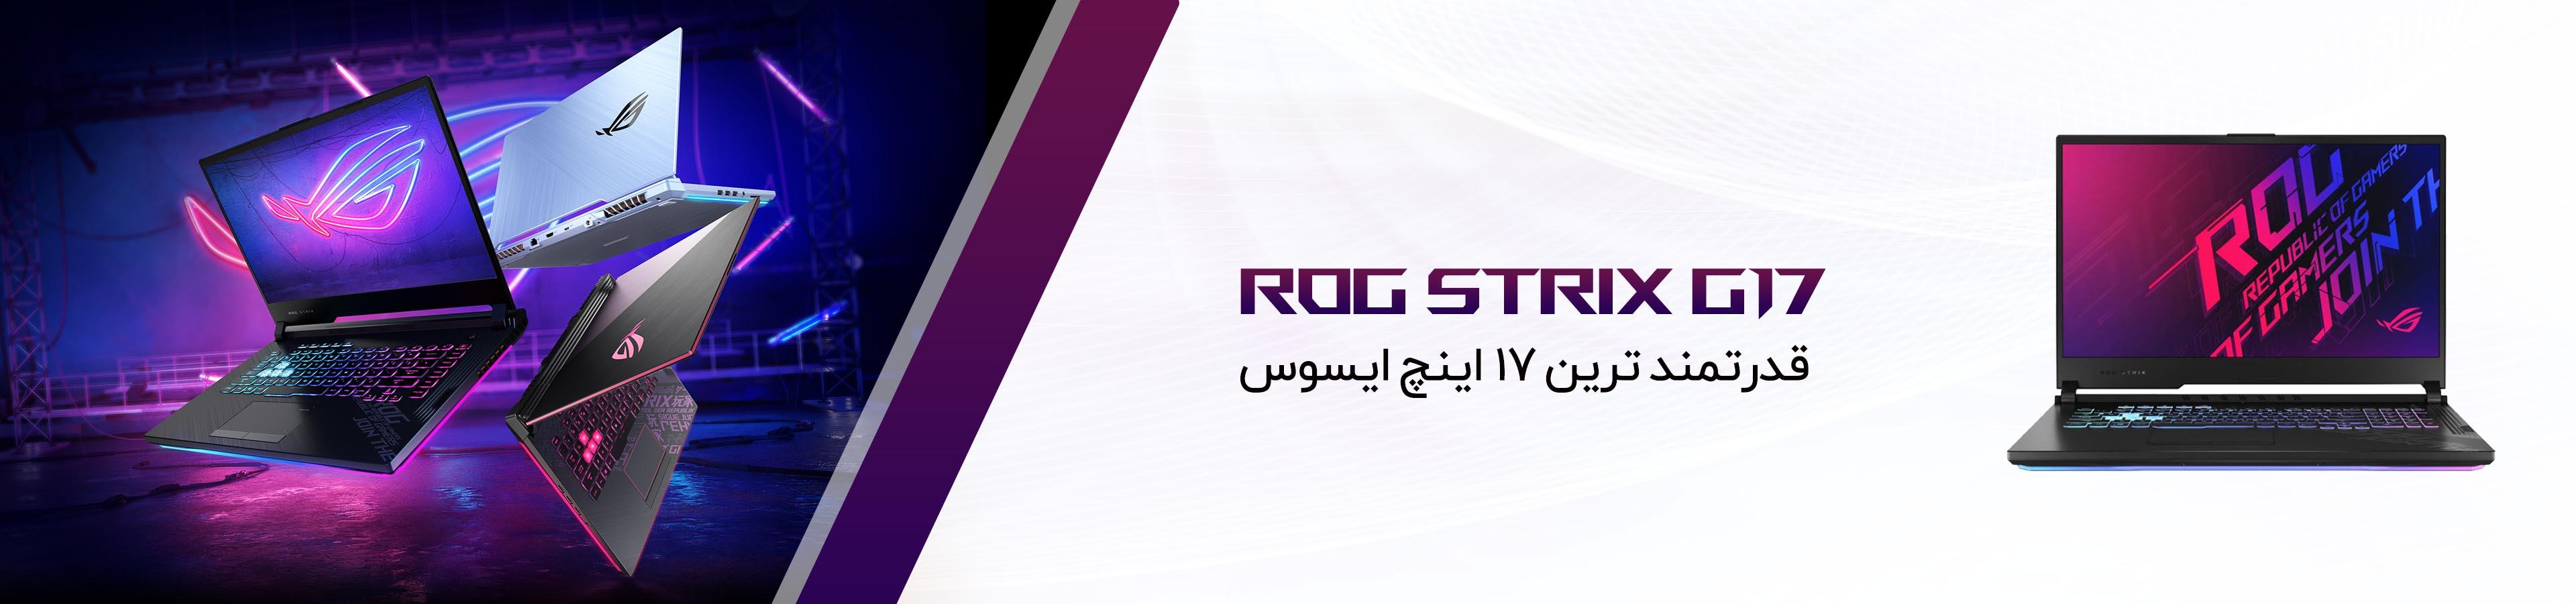 ASUS ROG G712